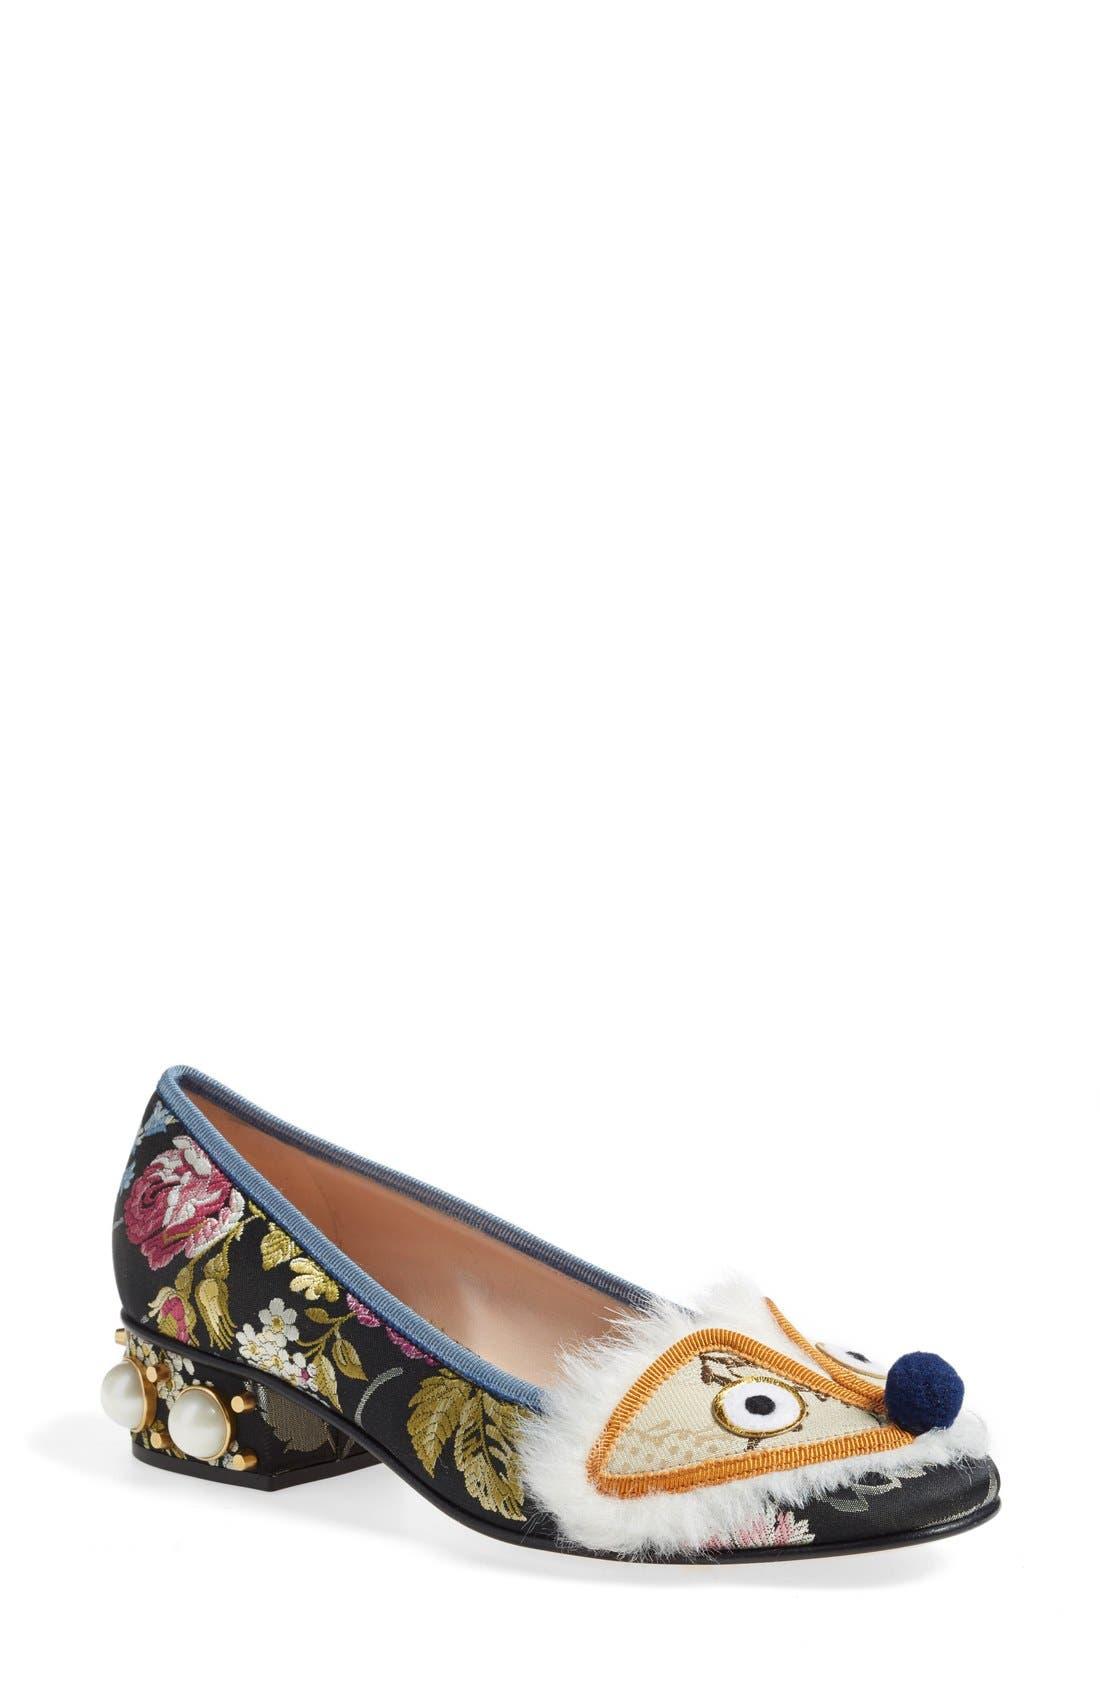 Alternate Image 1 Selected - Gucci 'Kimberly' Embellished Pump (Women)